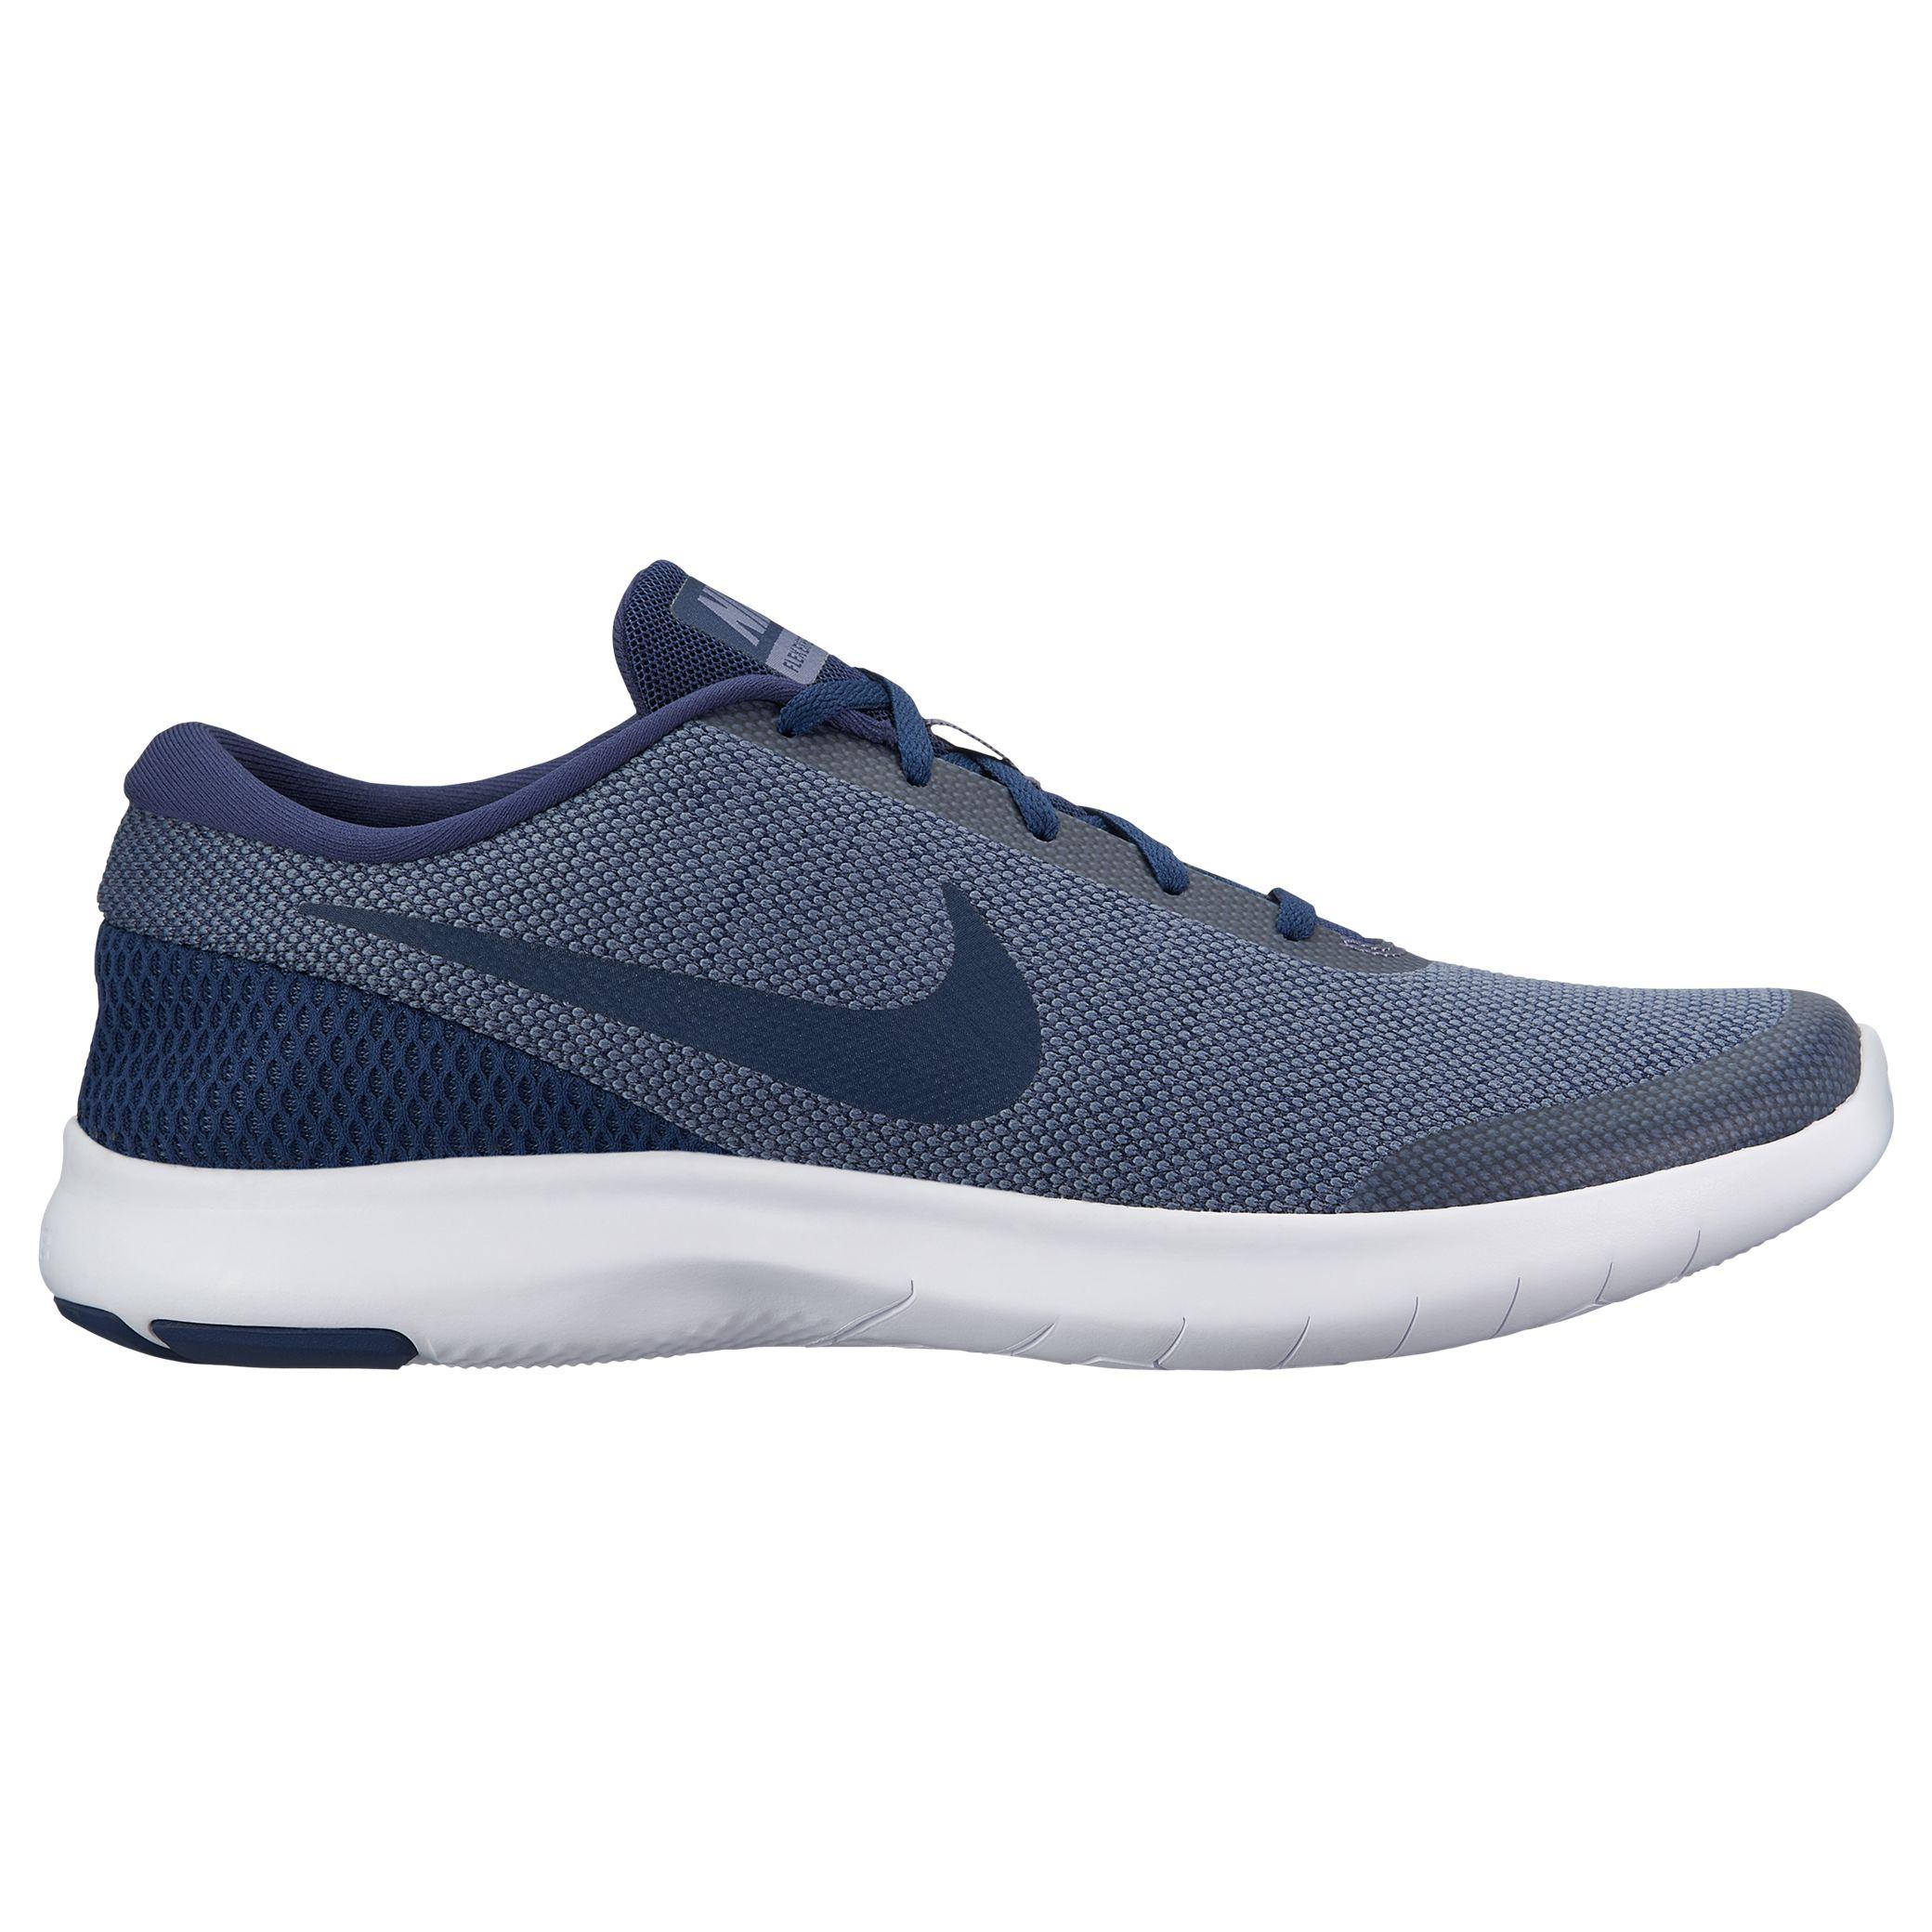 eb1d84fd241db Nike Flex Experience RN 7 Men s Running Shoes at John Lewis   Partners